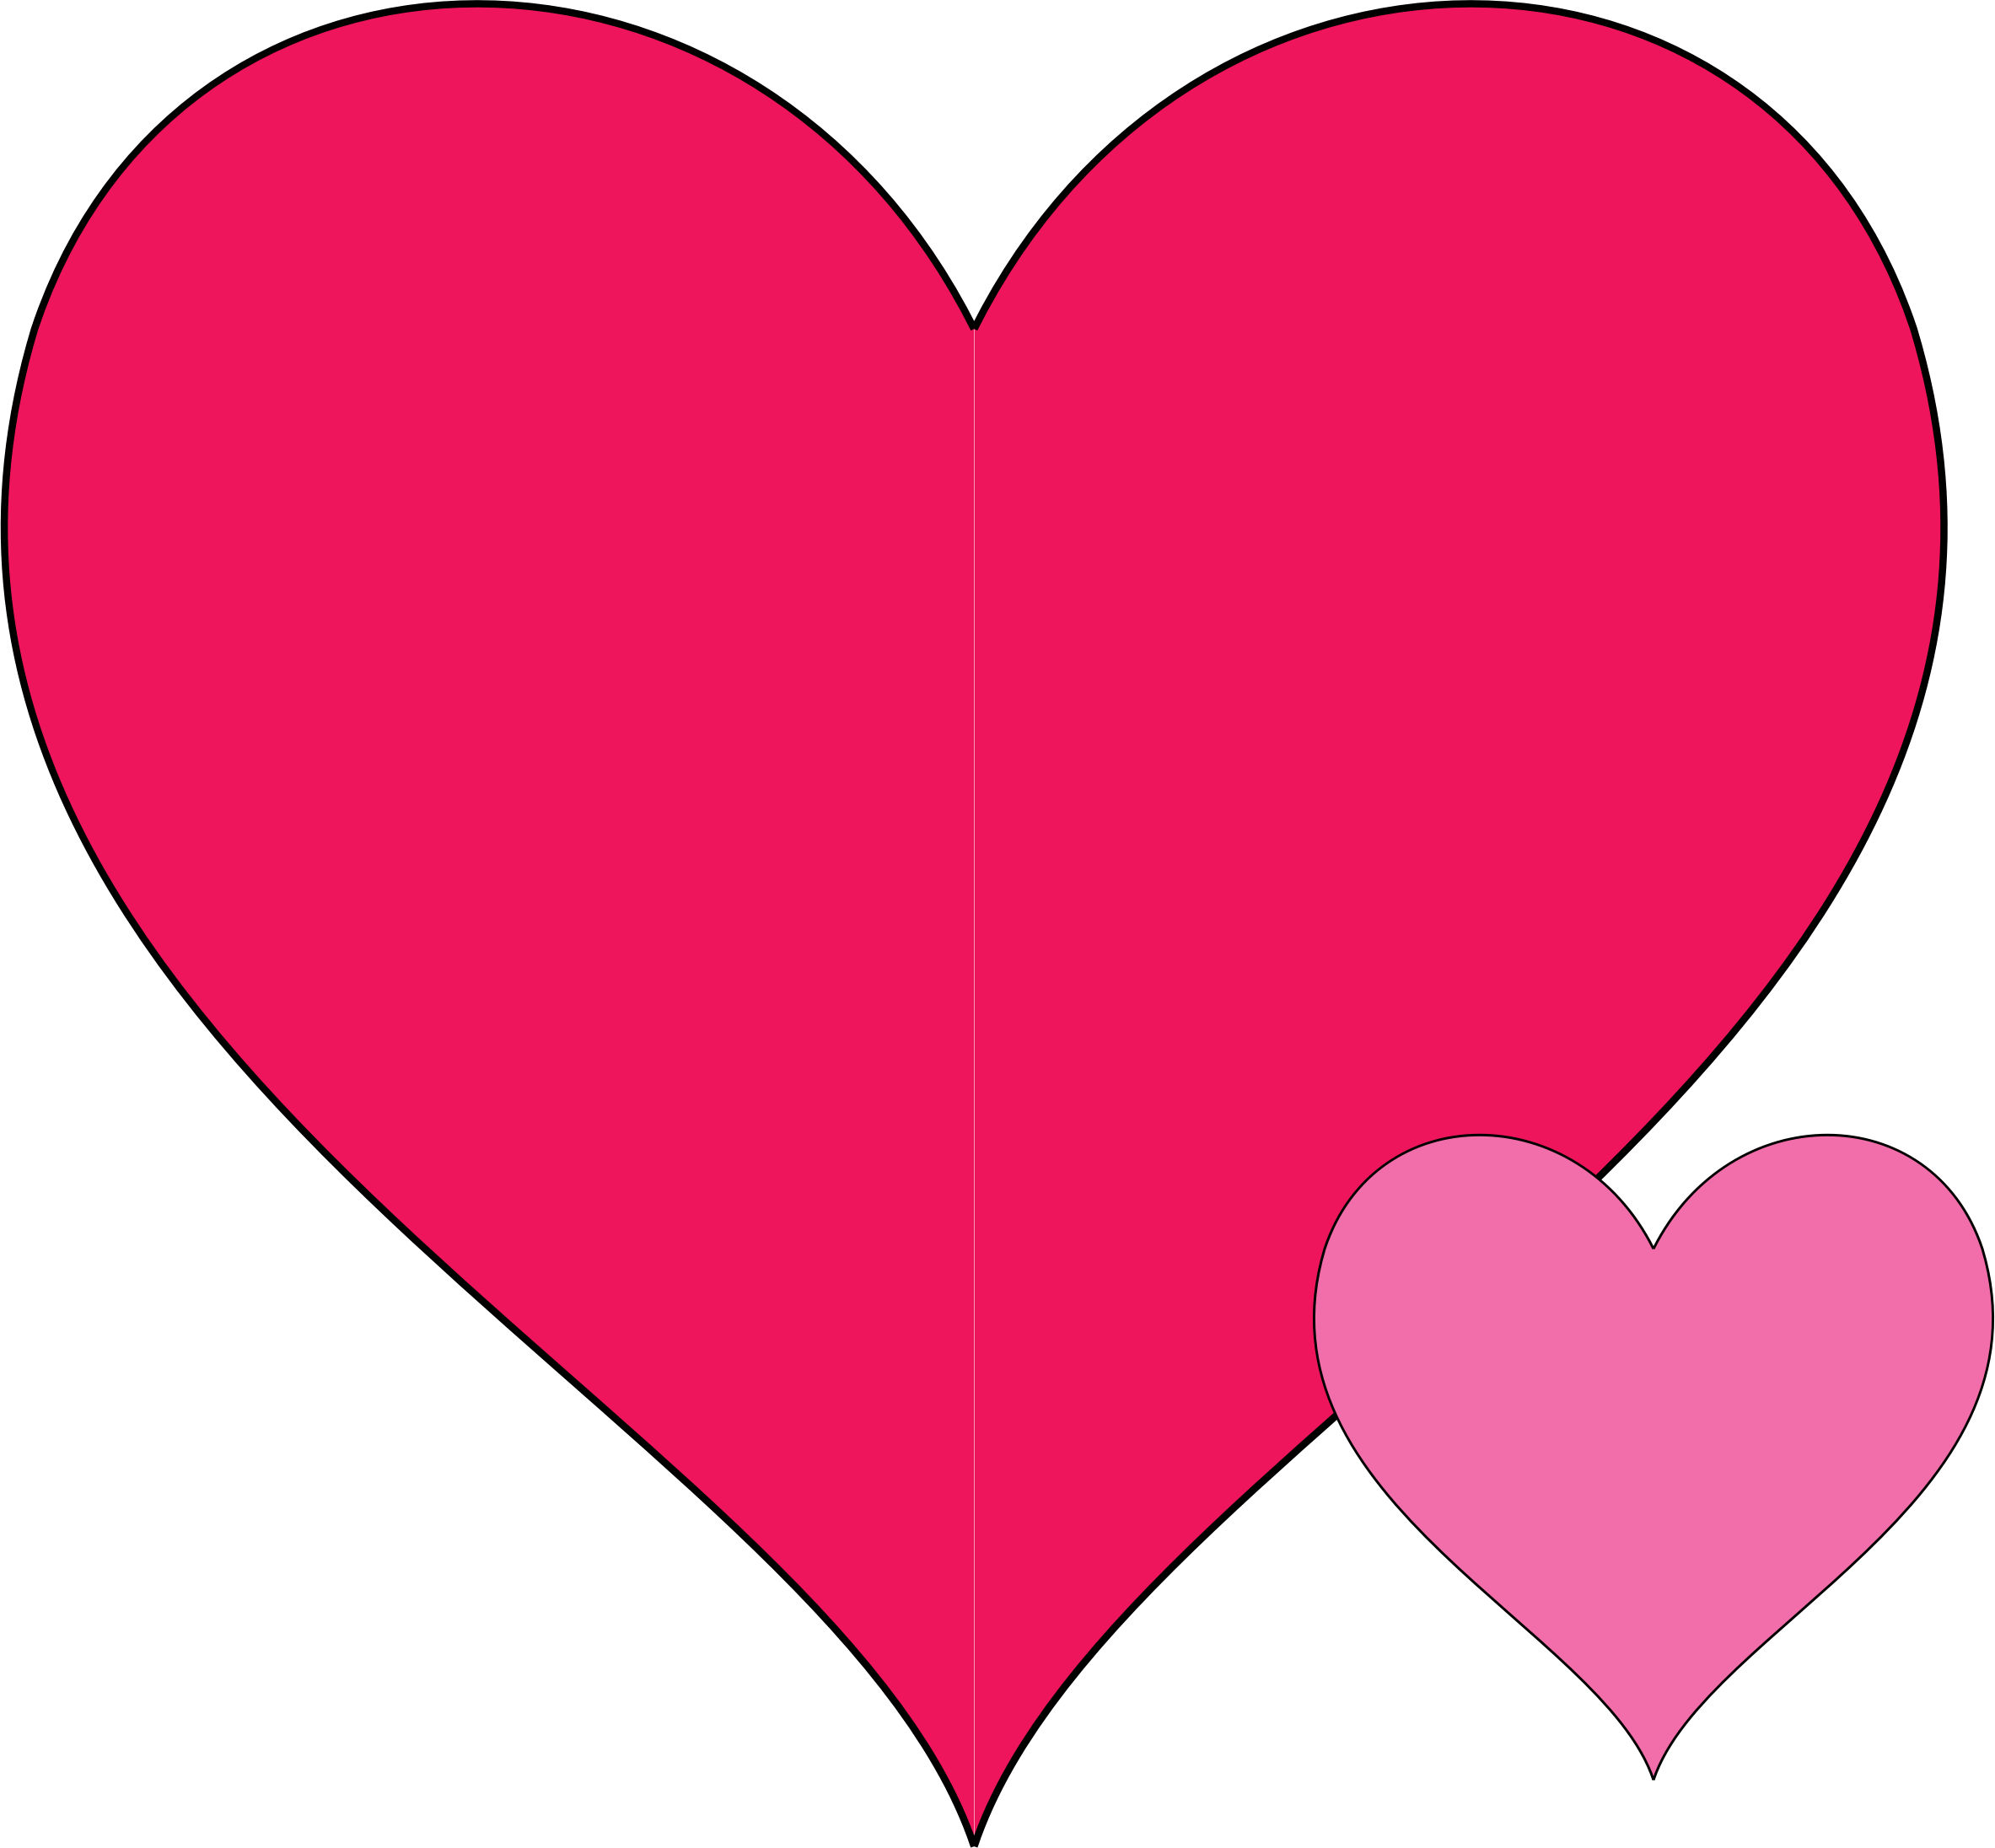 Clipart double hearts doodle